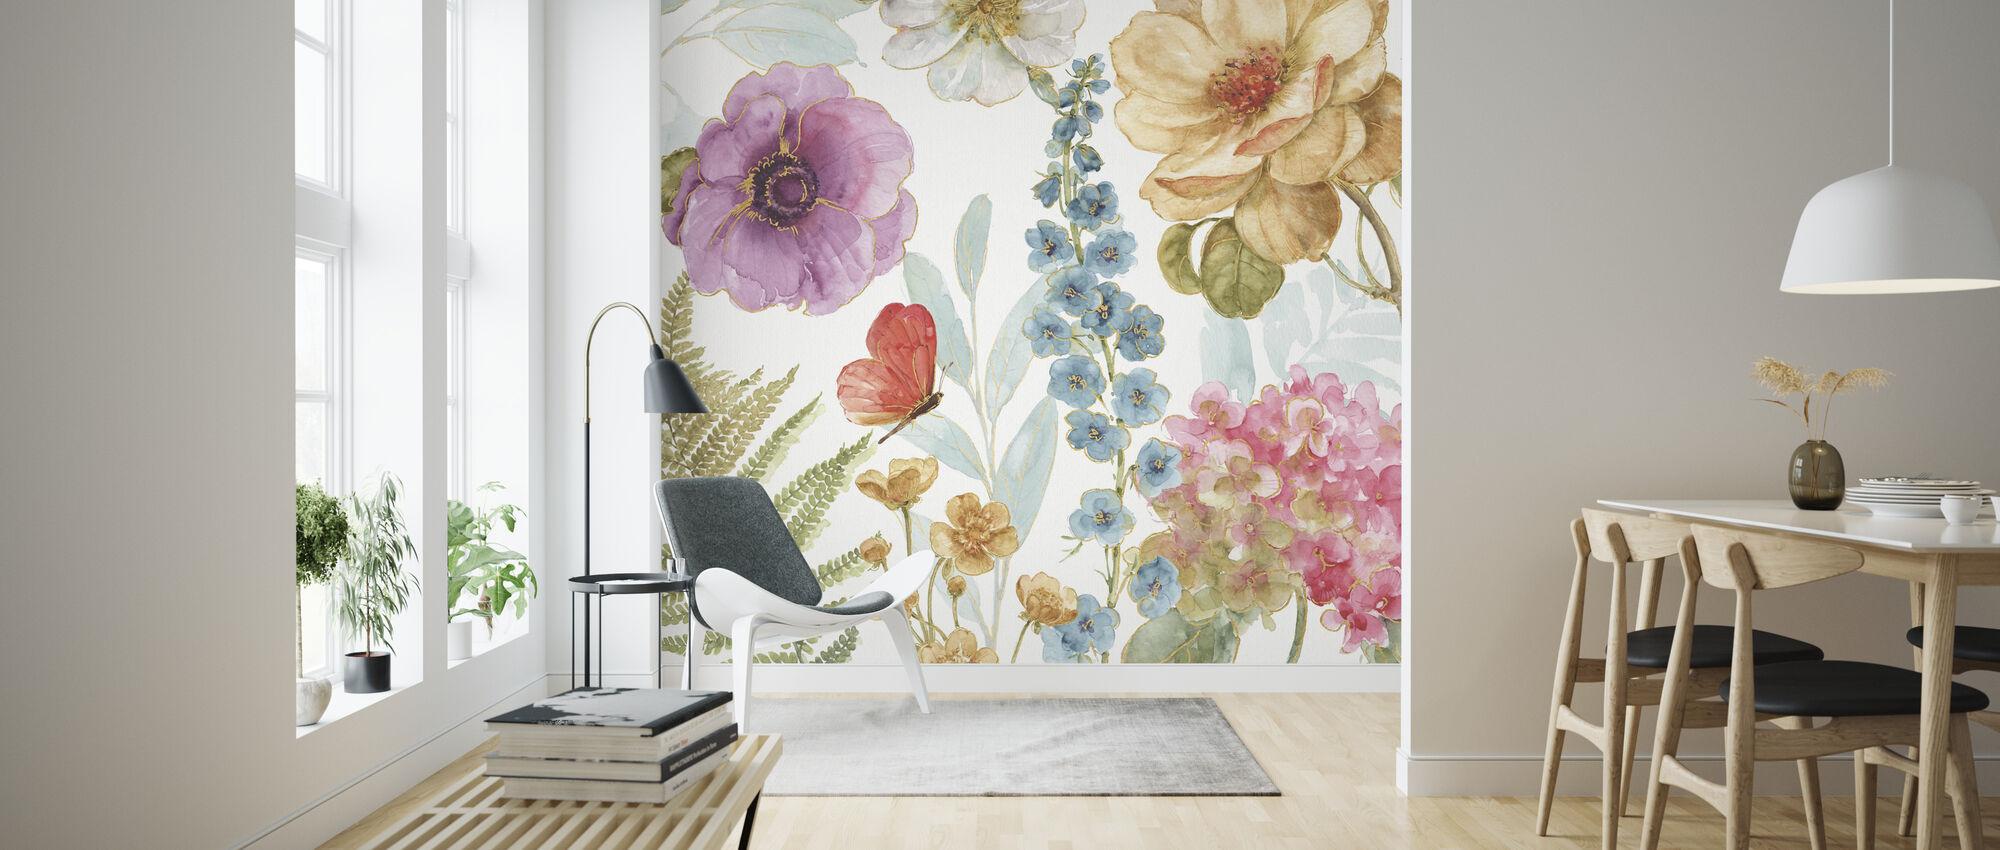 Rainbow Seeds Flowers 3 - Wallpaper - Living Room